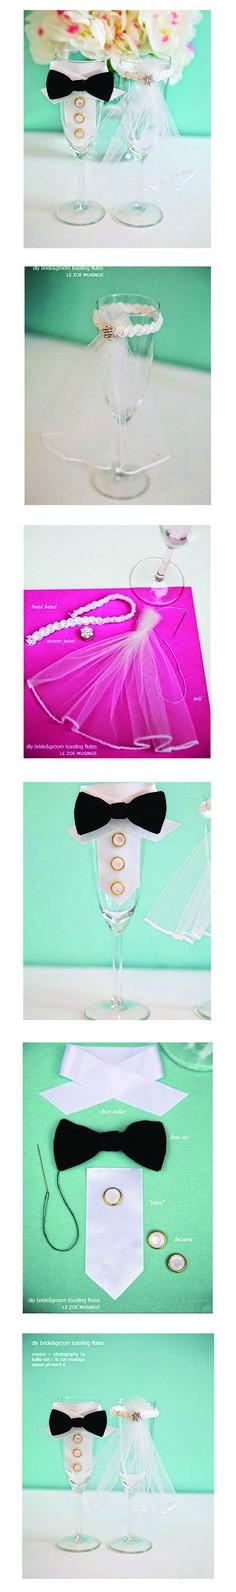 DIY Bride and Groom Wedding Glasses